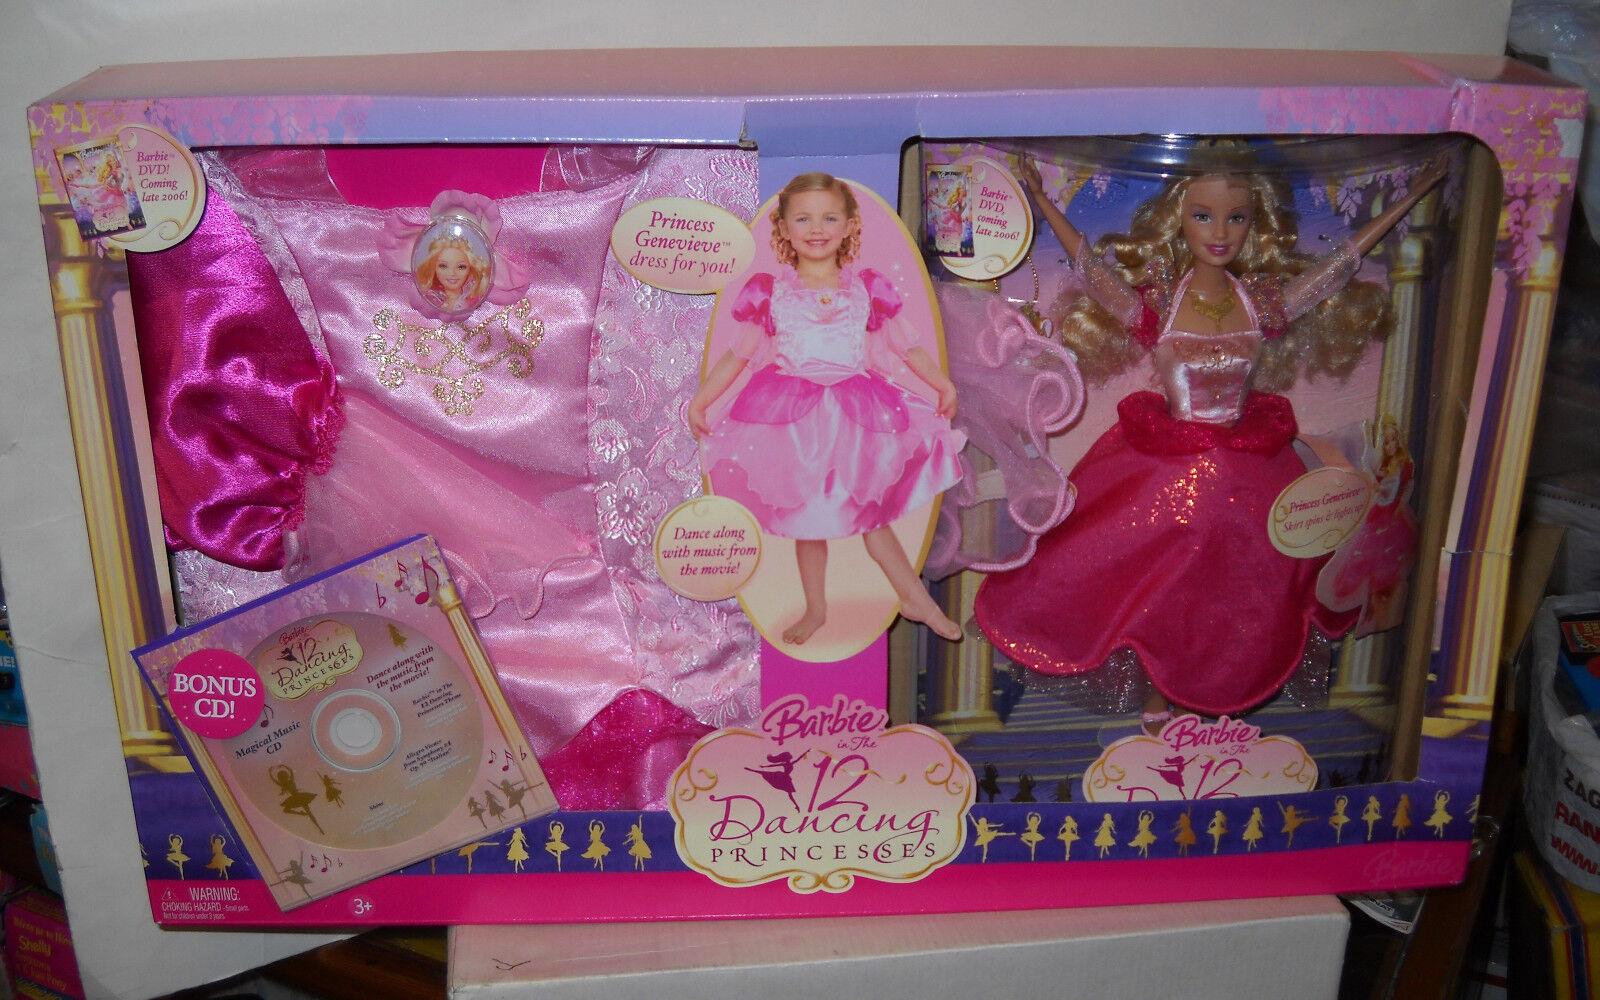 Nunca quitado de la Caja Mattel 12 tanzenden Prinzessinen Barbie Como Princesa Genevieve Giftset